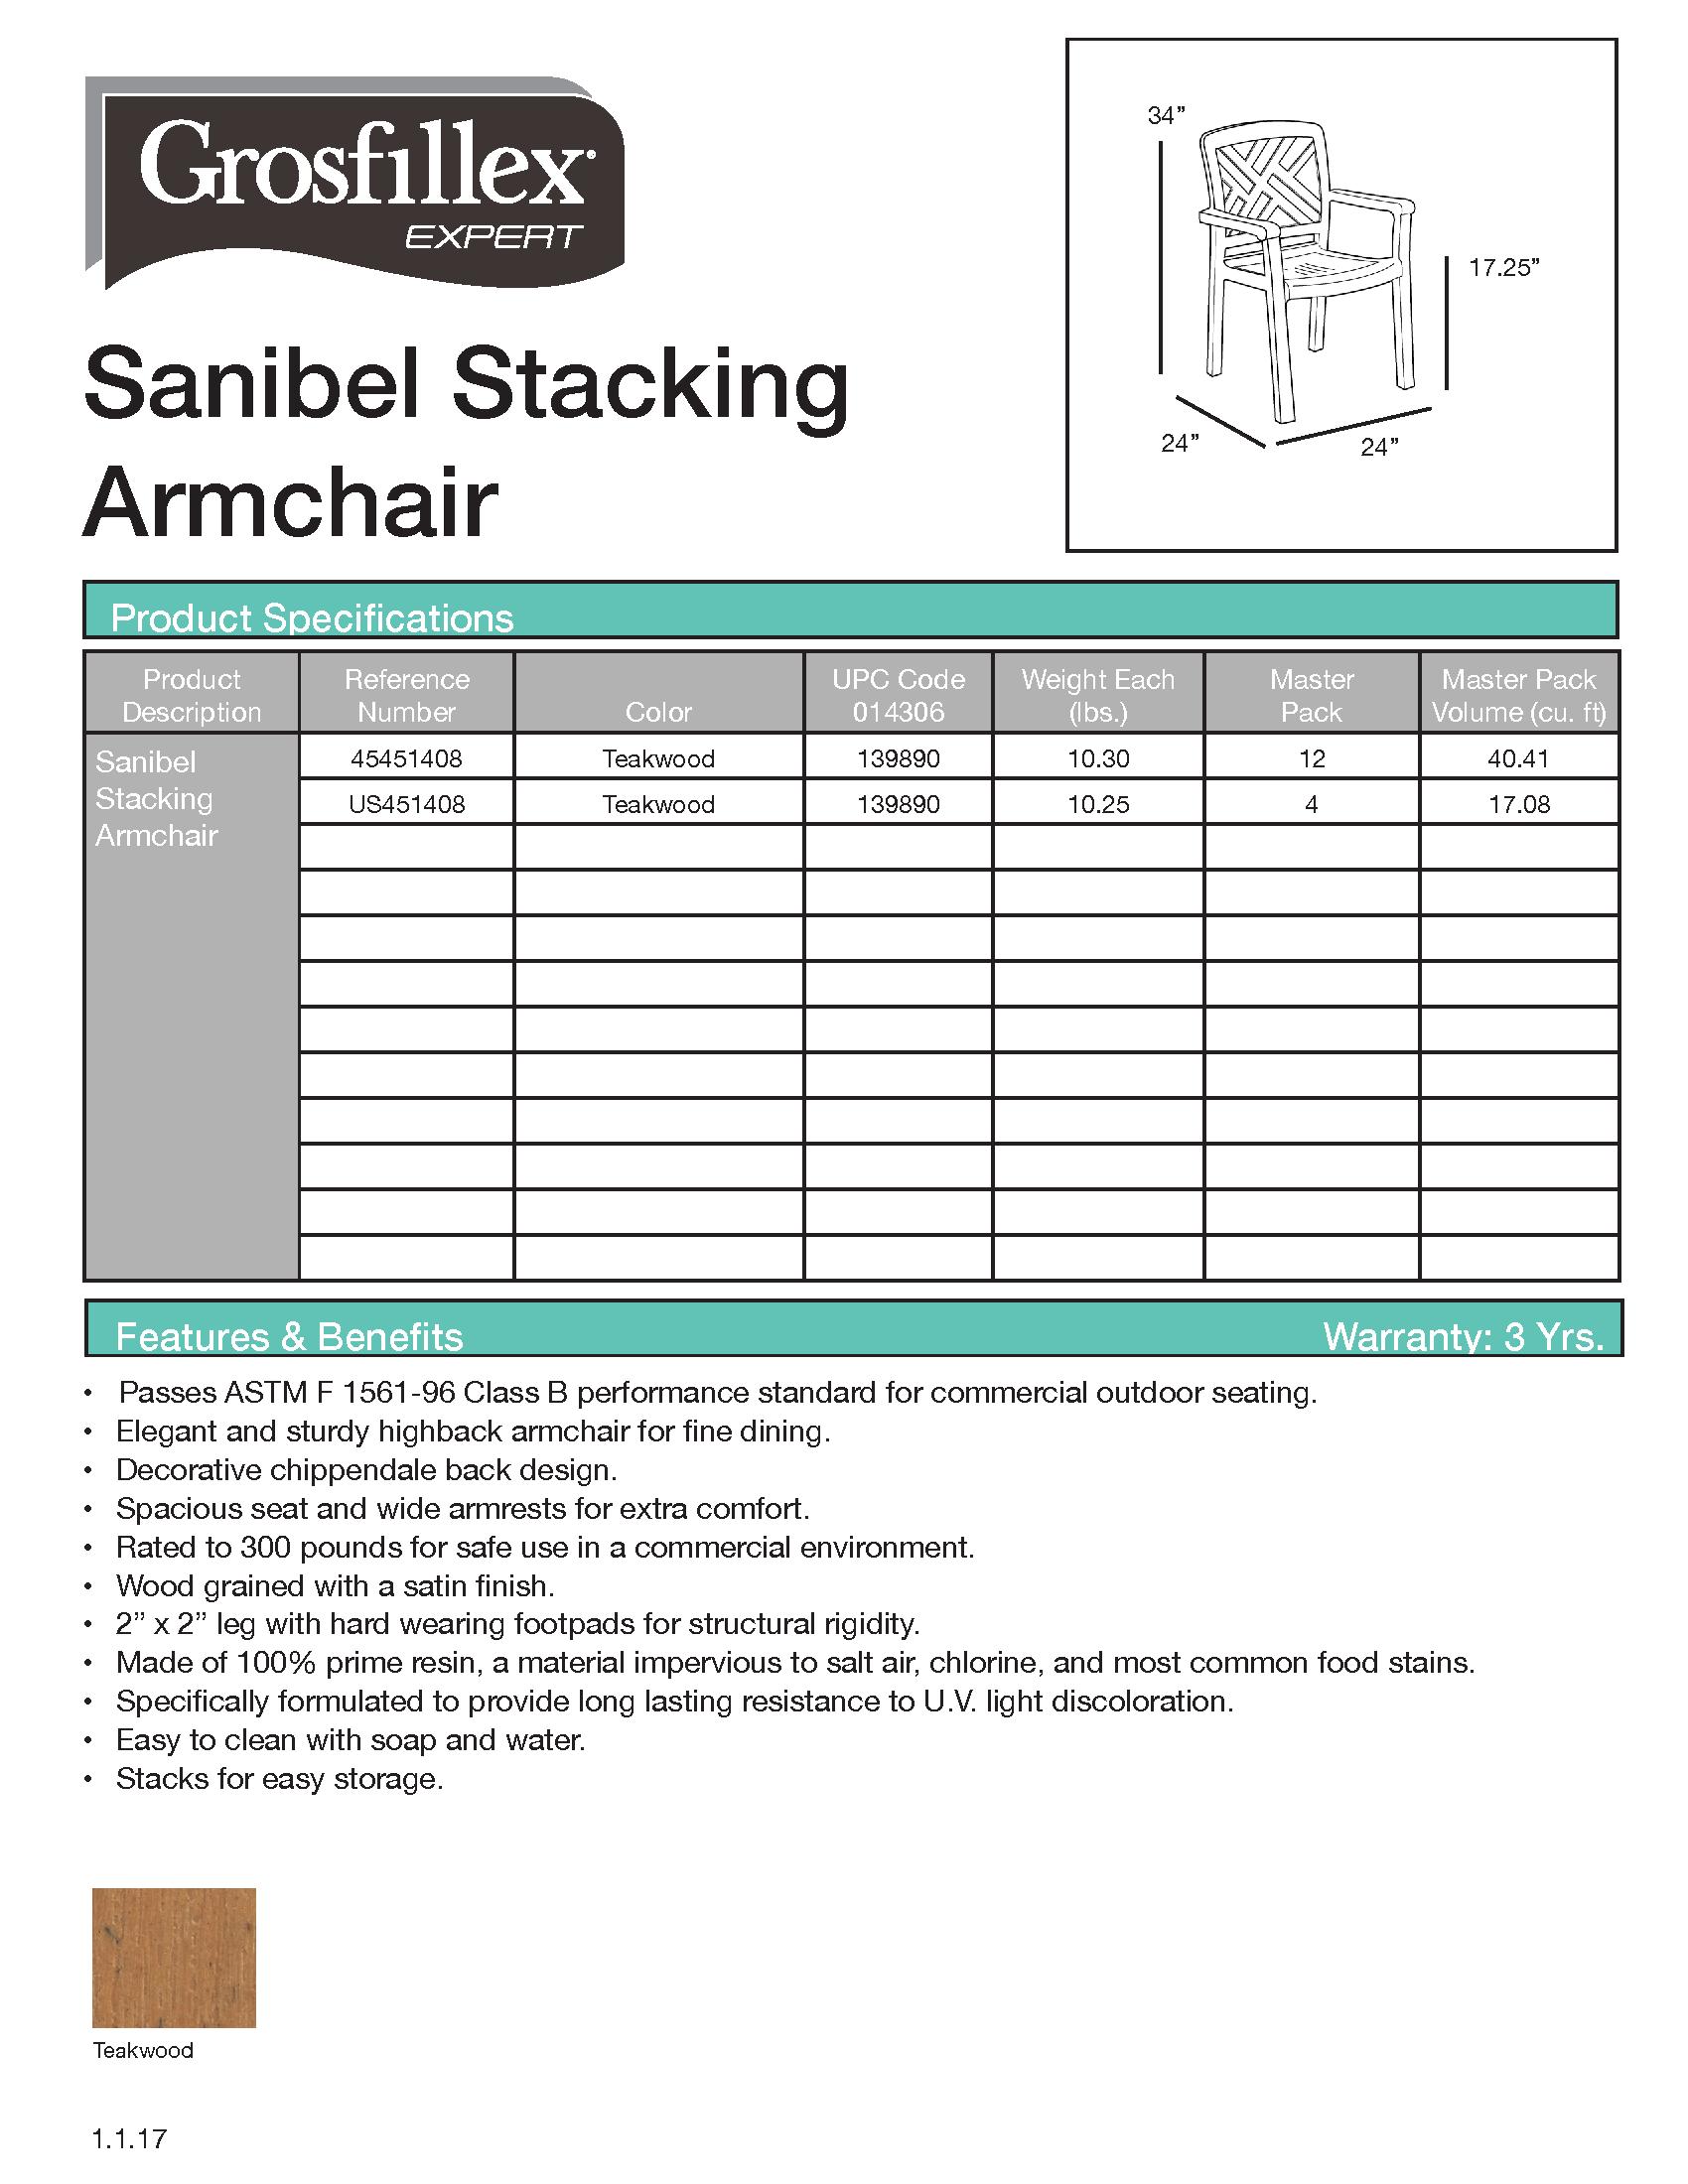 Sanibel Armchair